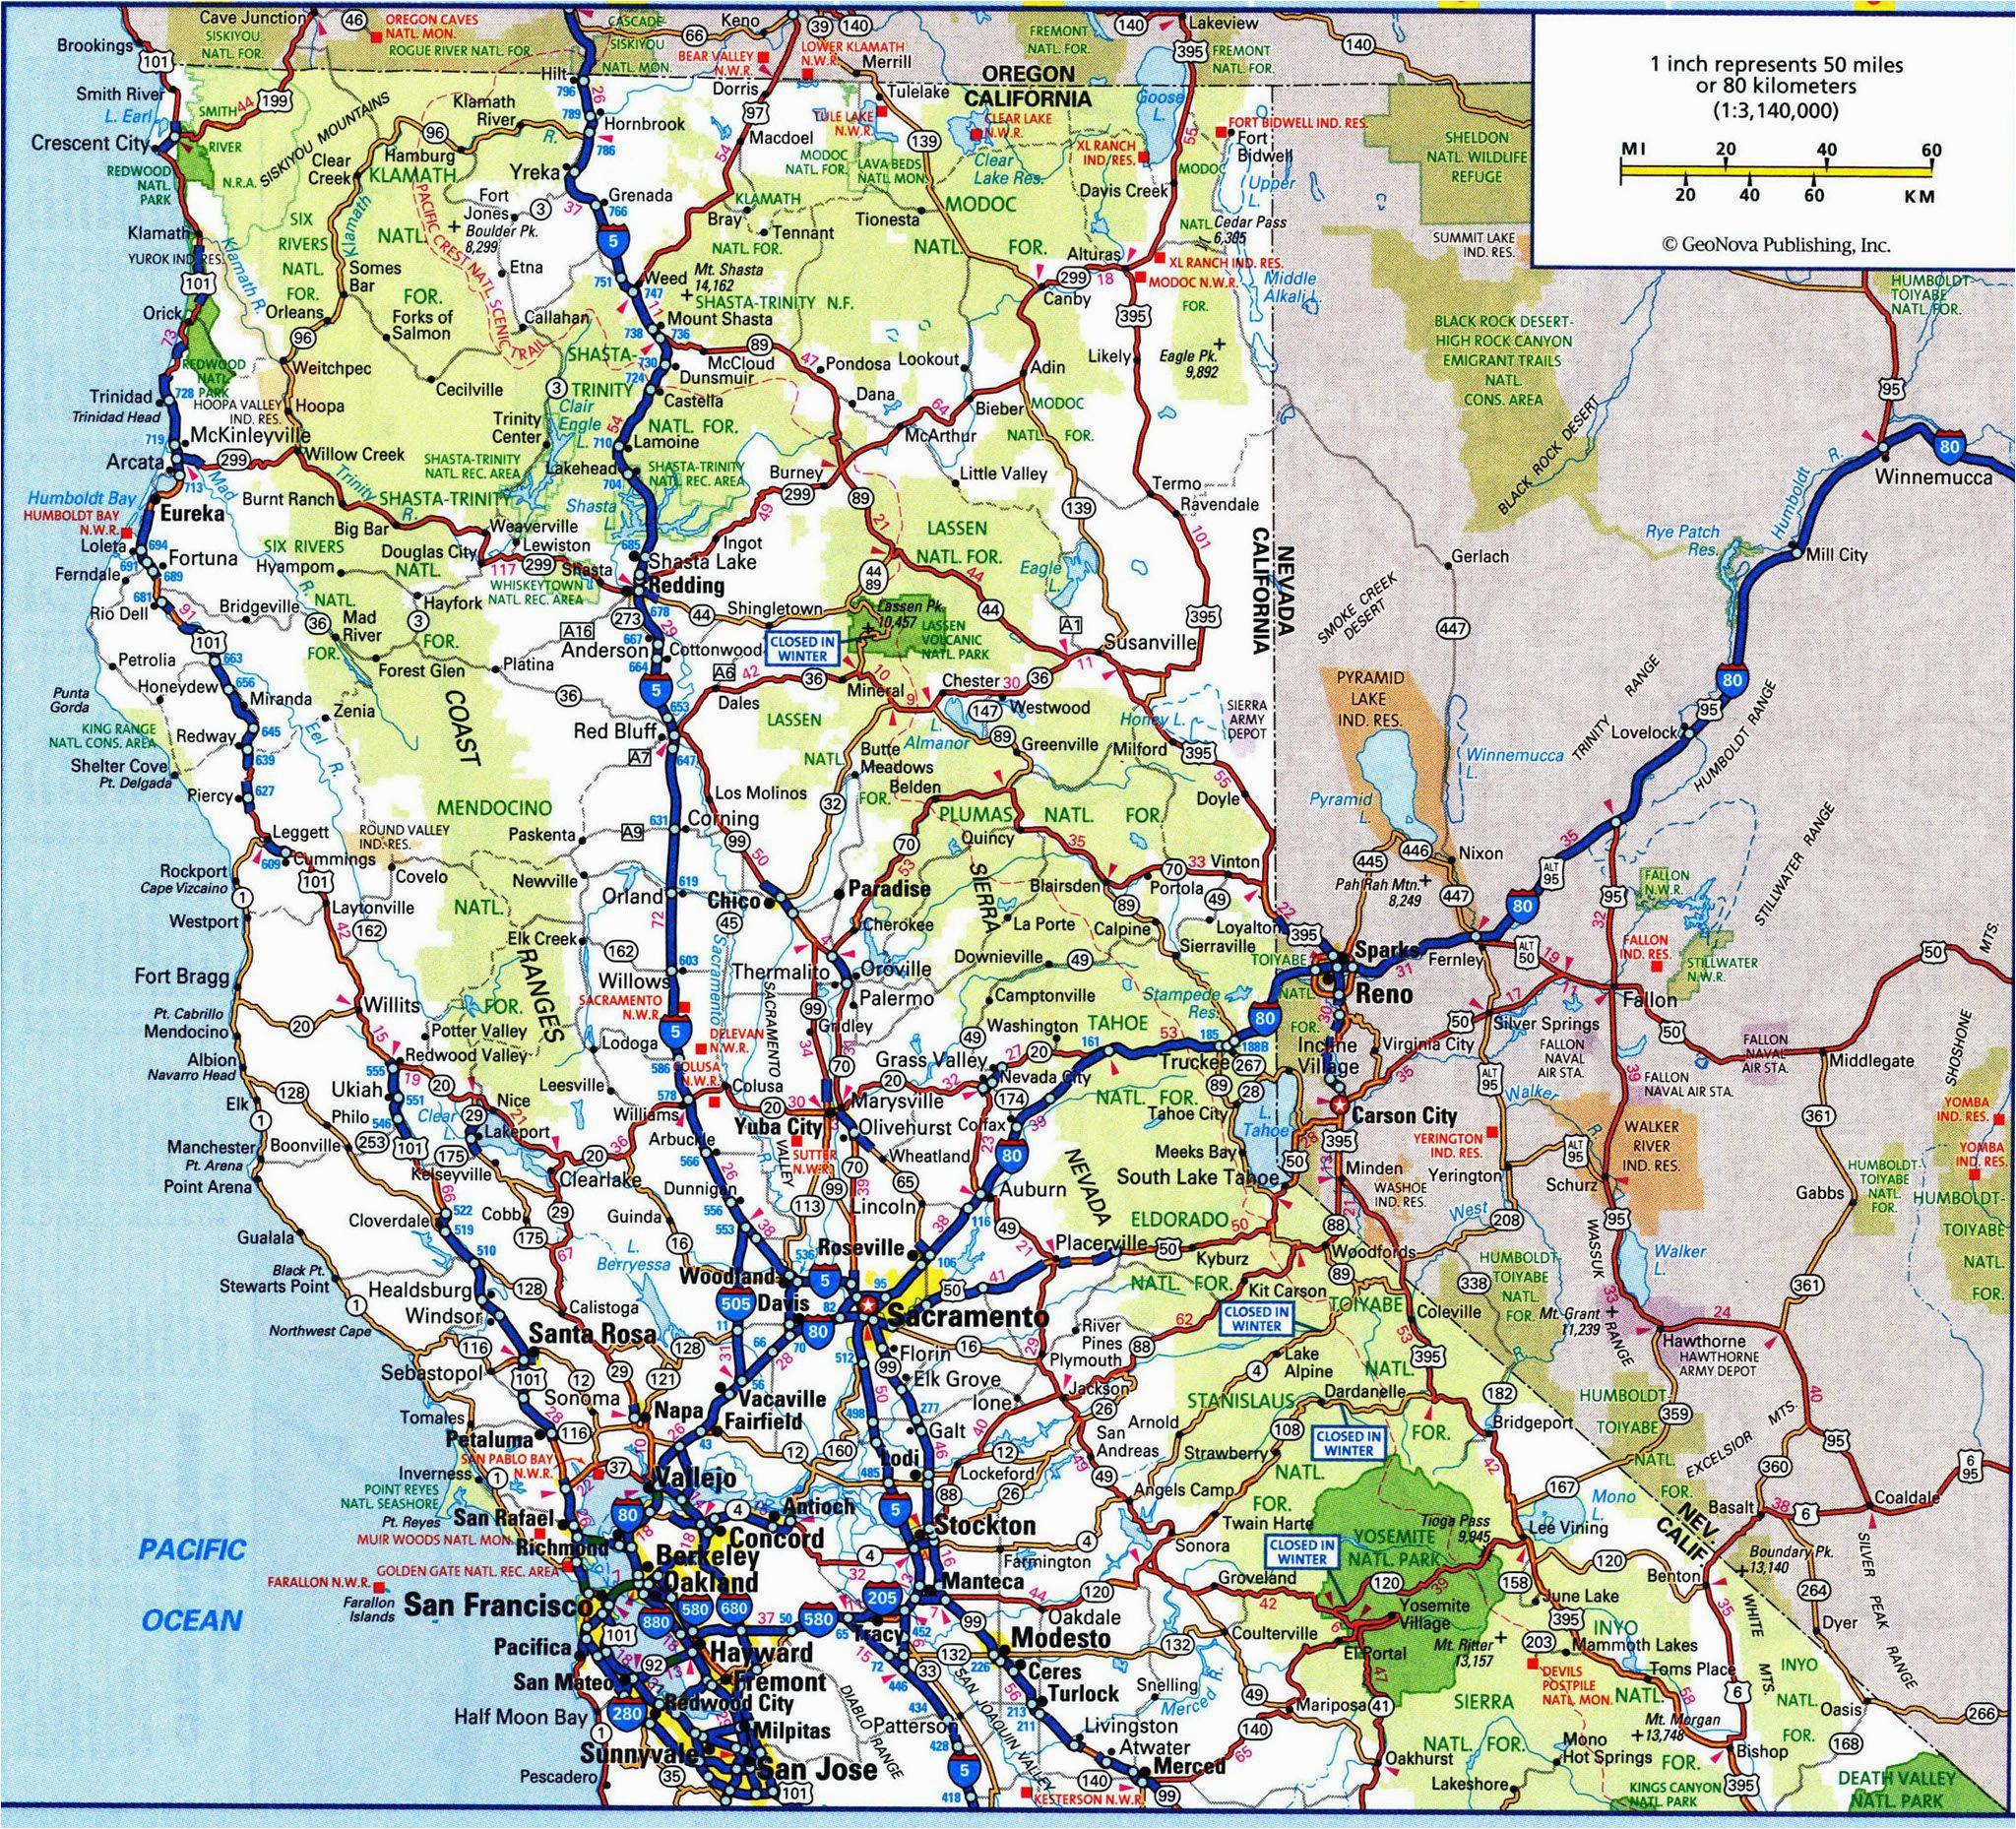 Oregon Road Map Pdf Road Map Of California and oregon New Us atlas